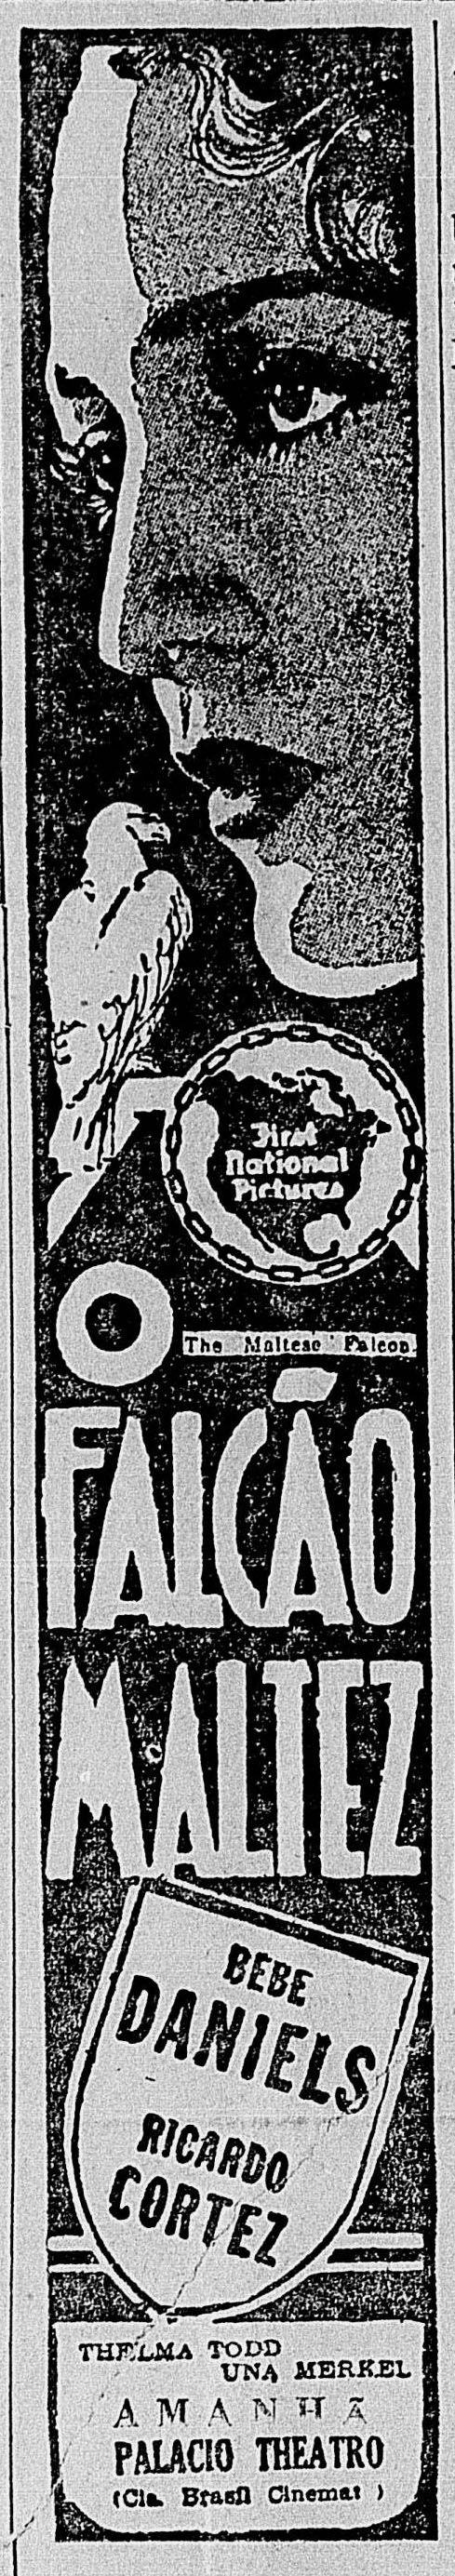 1931 - THE MALTESE FALCON - Roy Del Ruth - (DIARIO CARIOCA, Sunday, January 31, 1932)